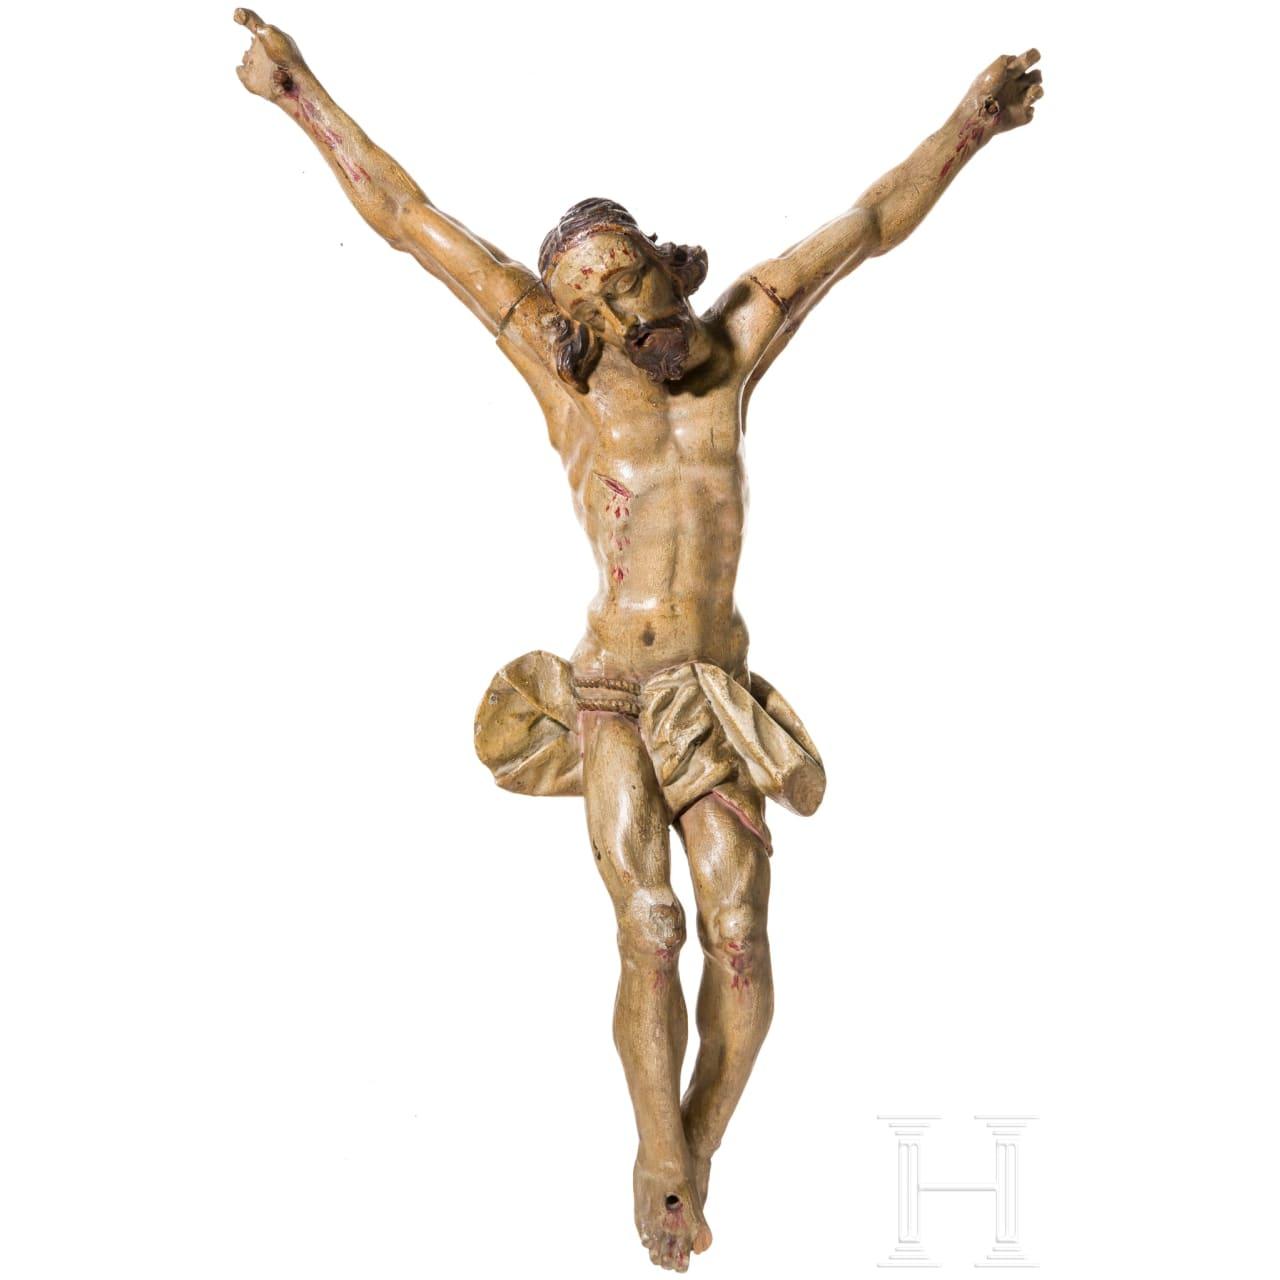 Barocker Christuskorpus, süddeutsch, 17. Jhdt.